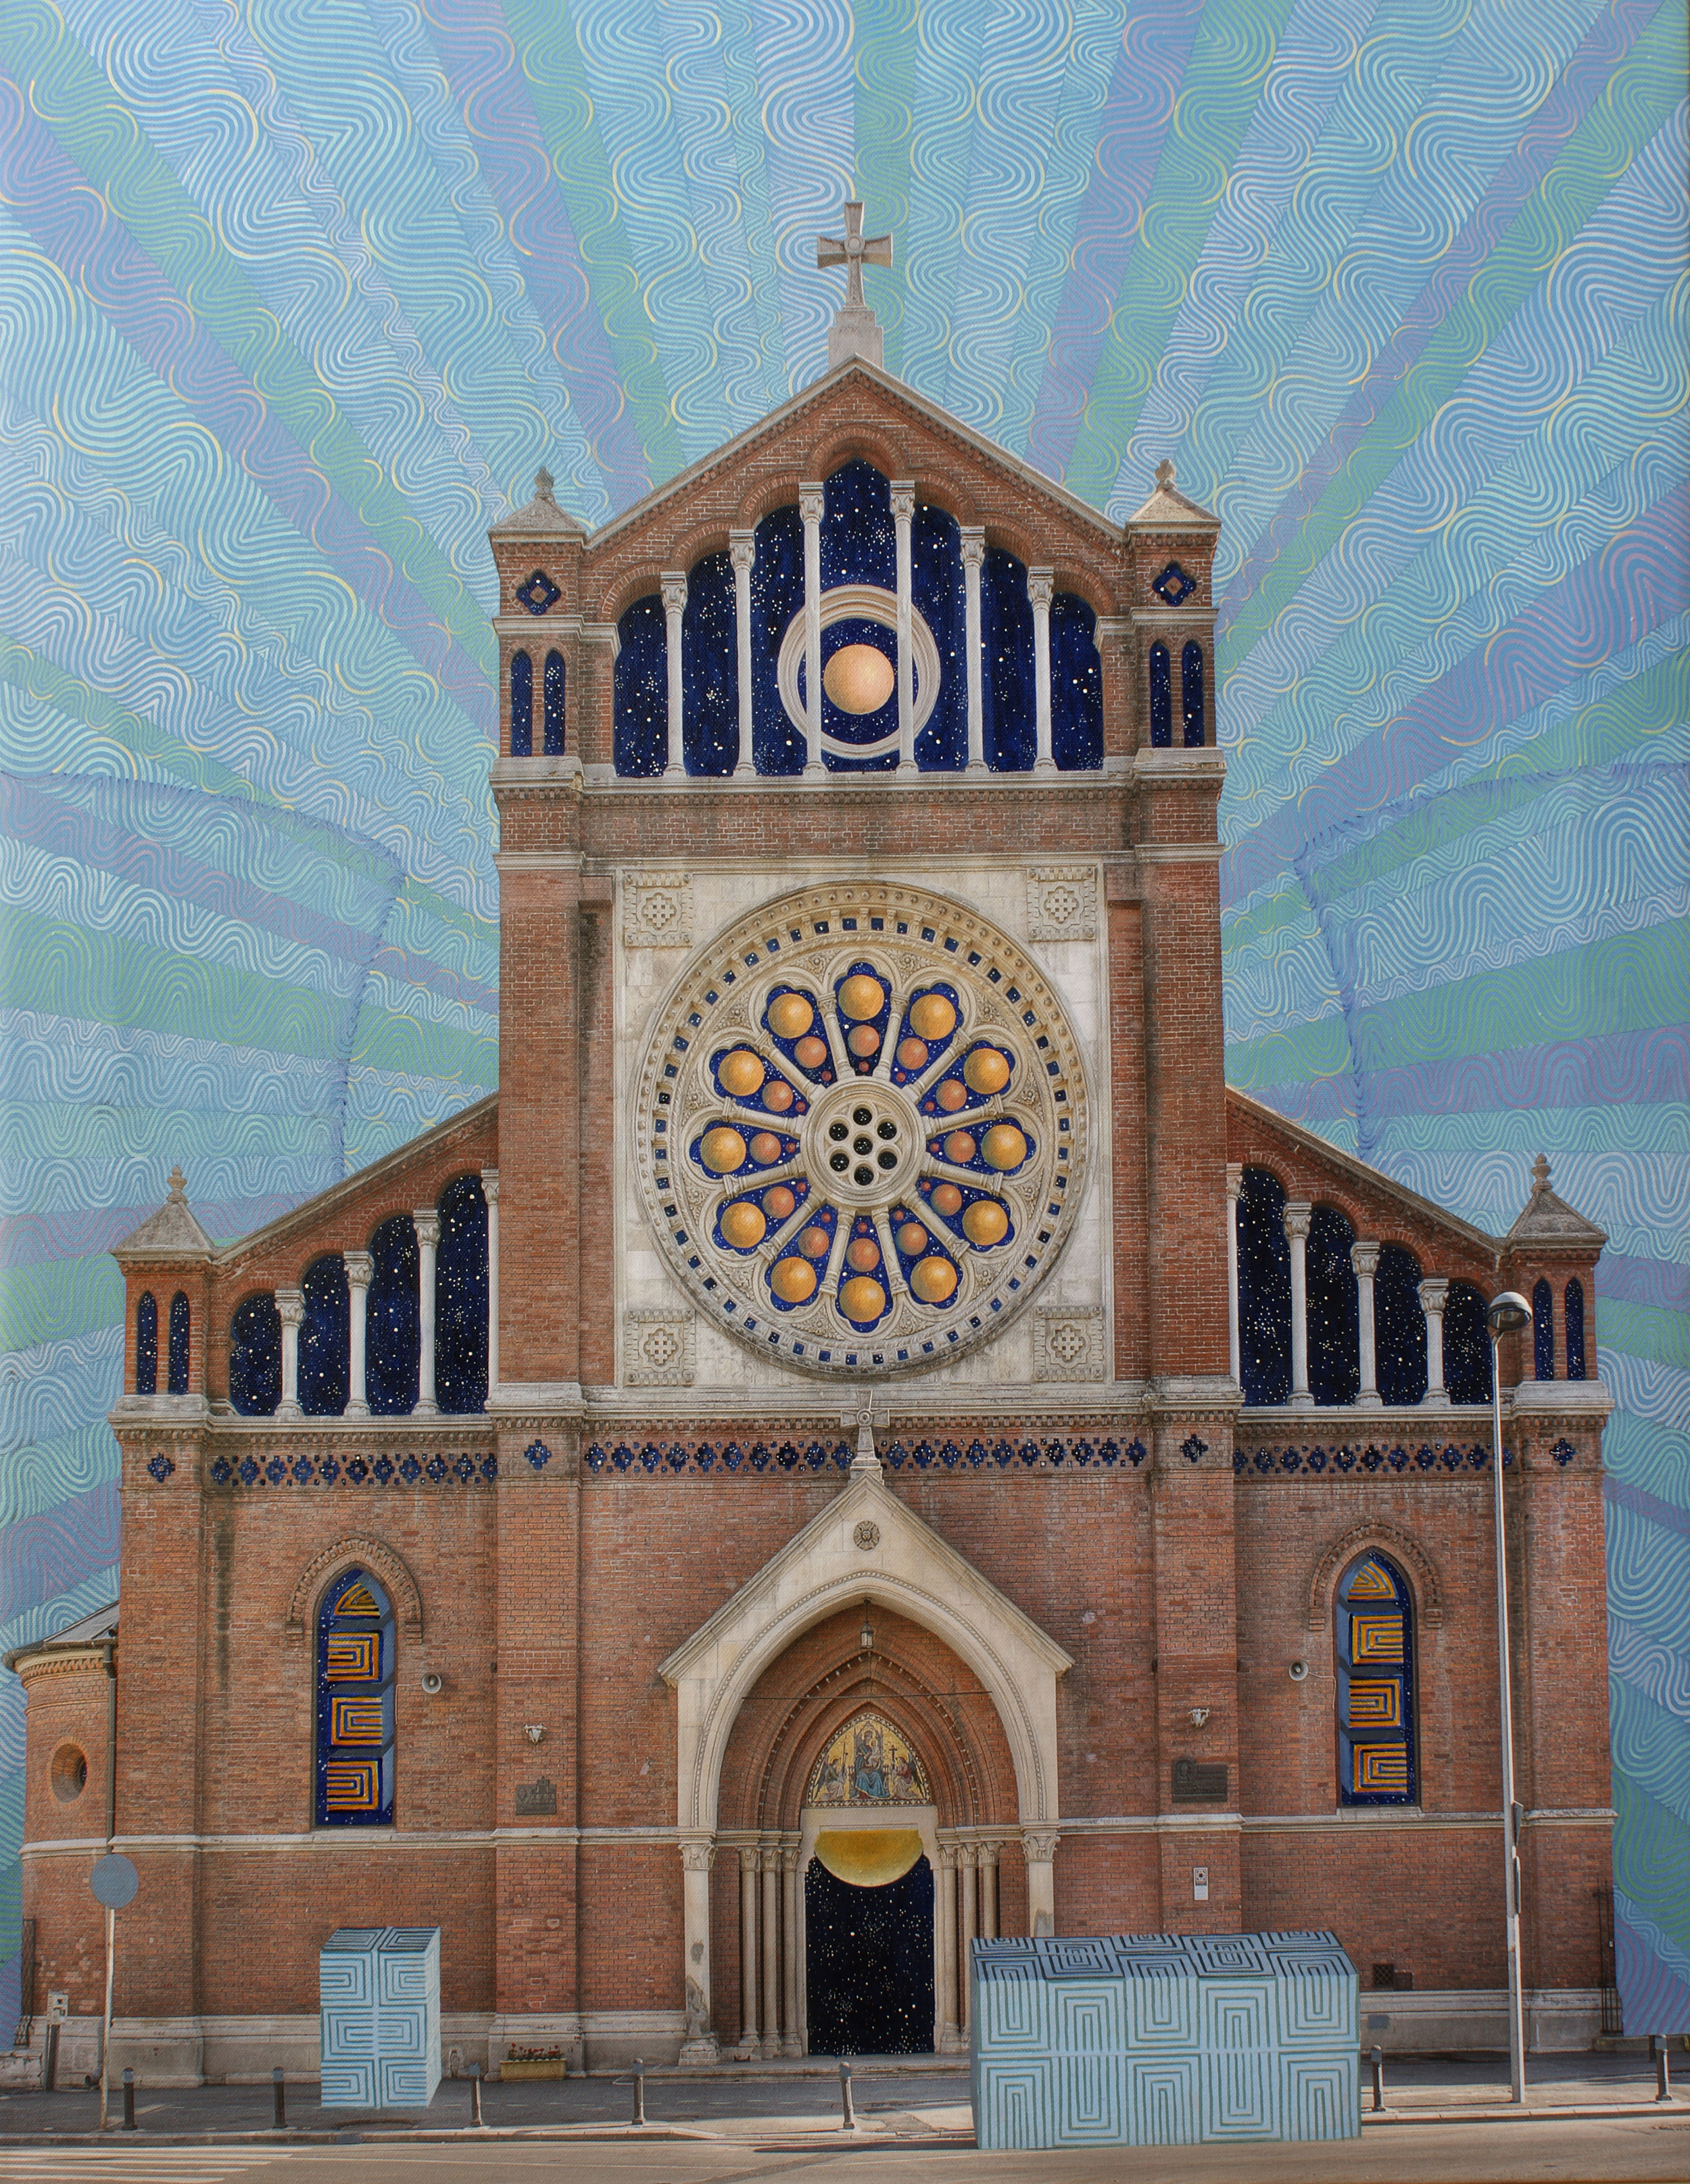 St. Joseph Catherdral